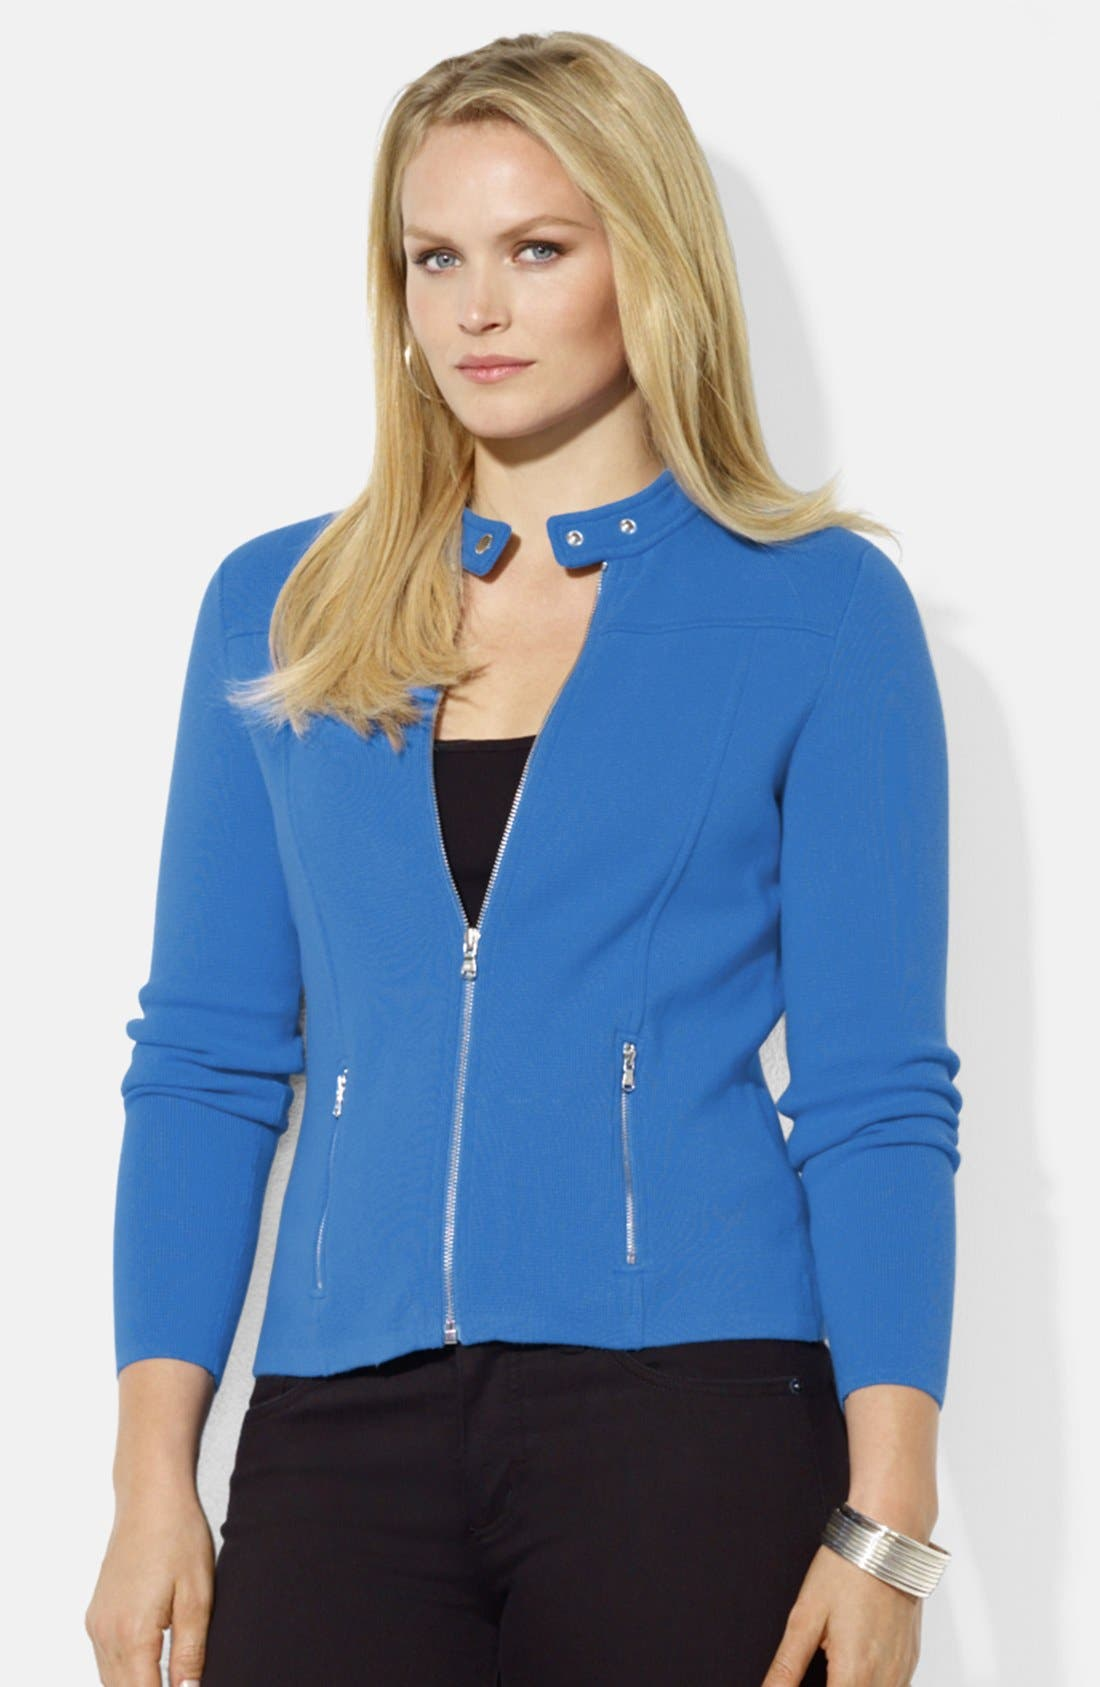 Alternate Image 1 Selected - Lauren Ralph Lauren Fitted Knit Moto Cardigan (Plus Size)